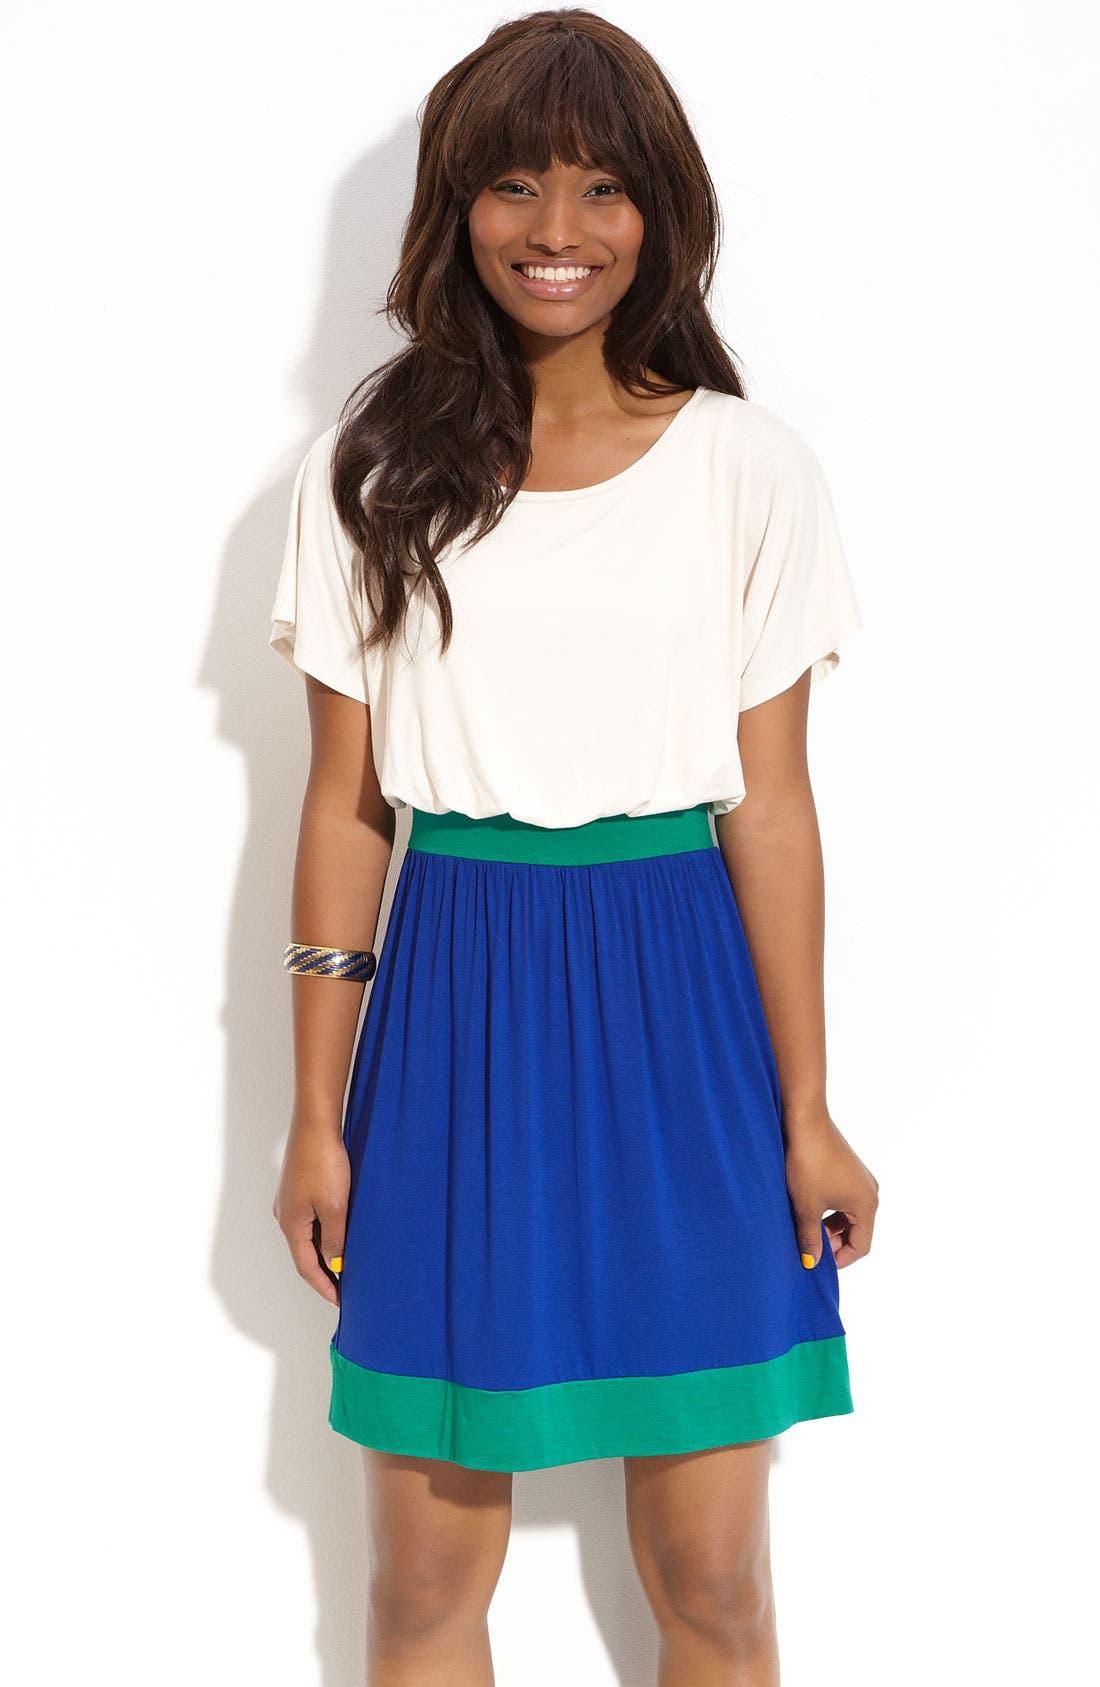 Alternate Image 1 Selected - Lush Open Back Colorblock Dress (Juniors)